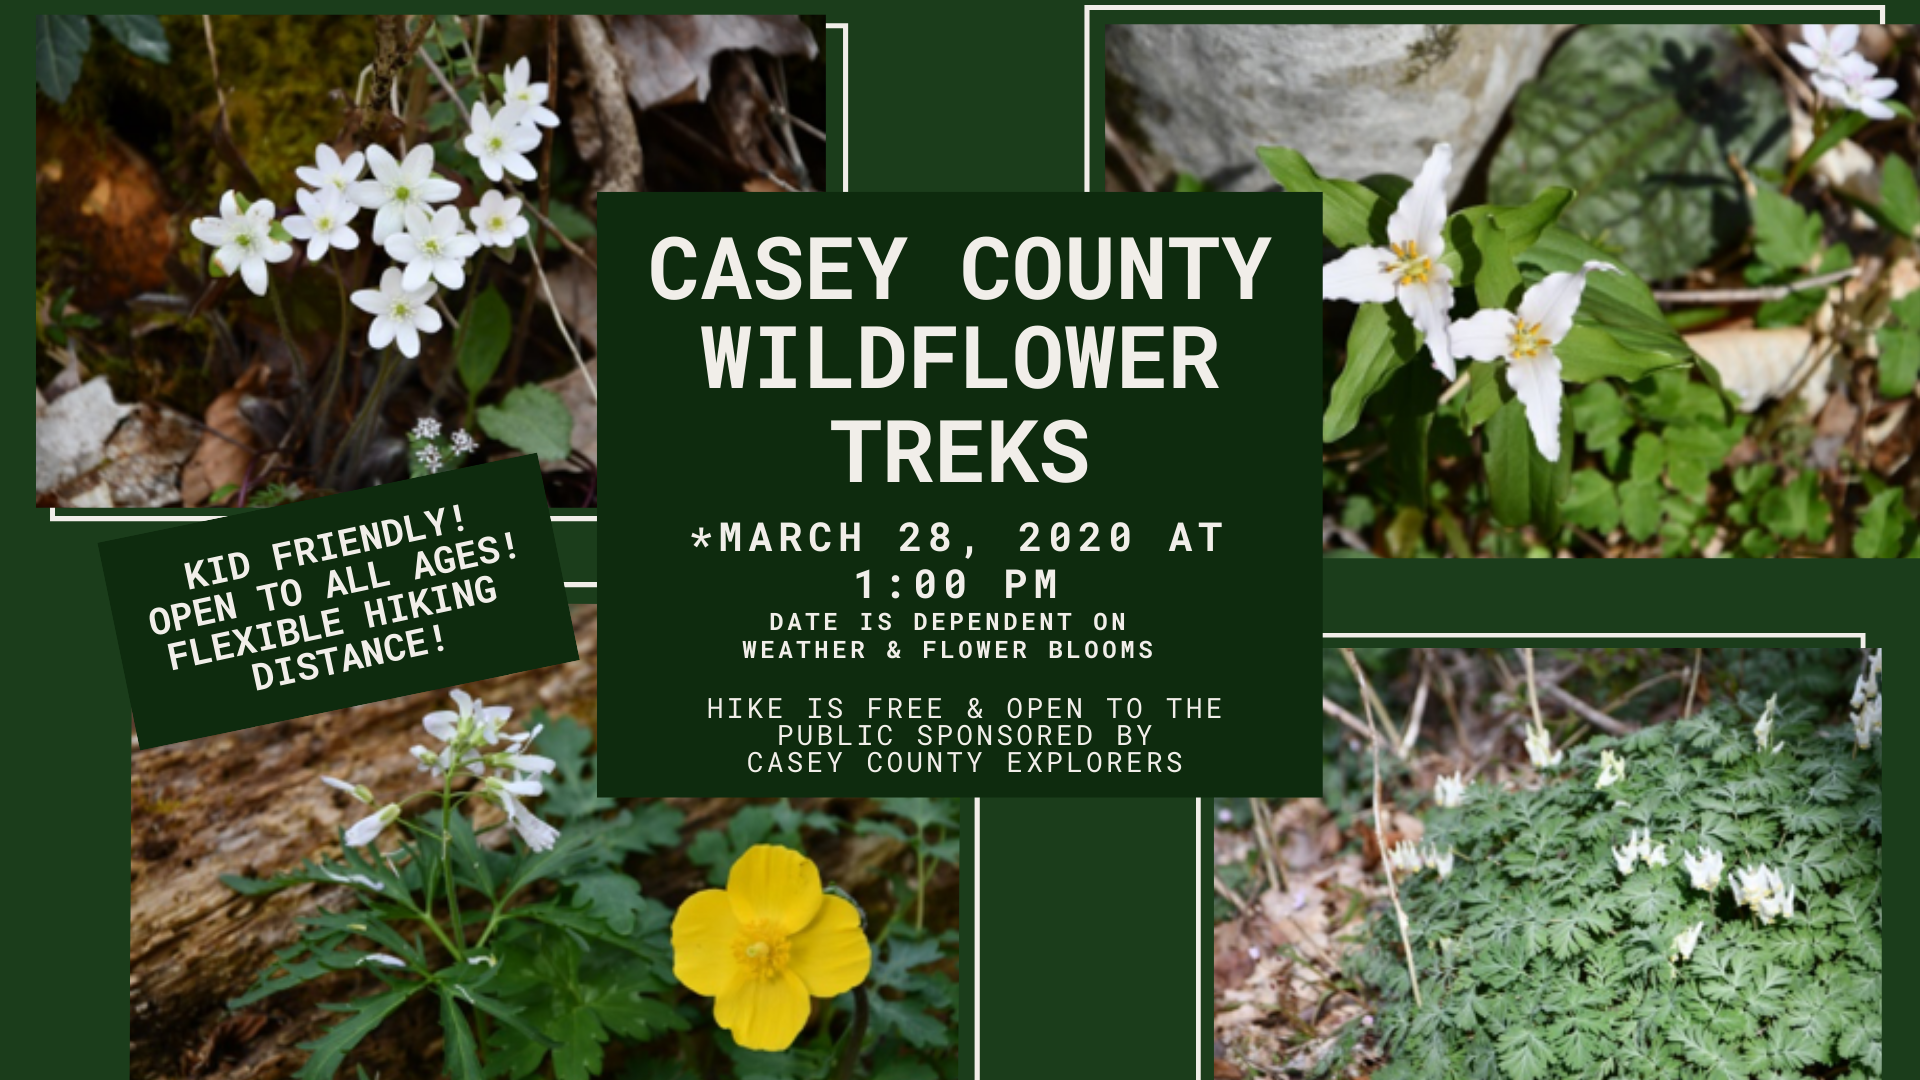 Casey County Wildflower Treks